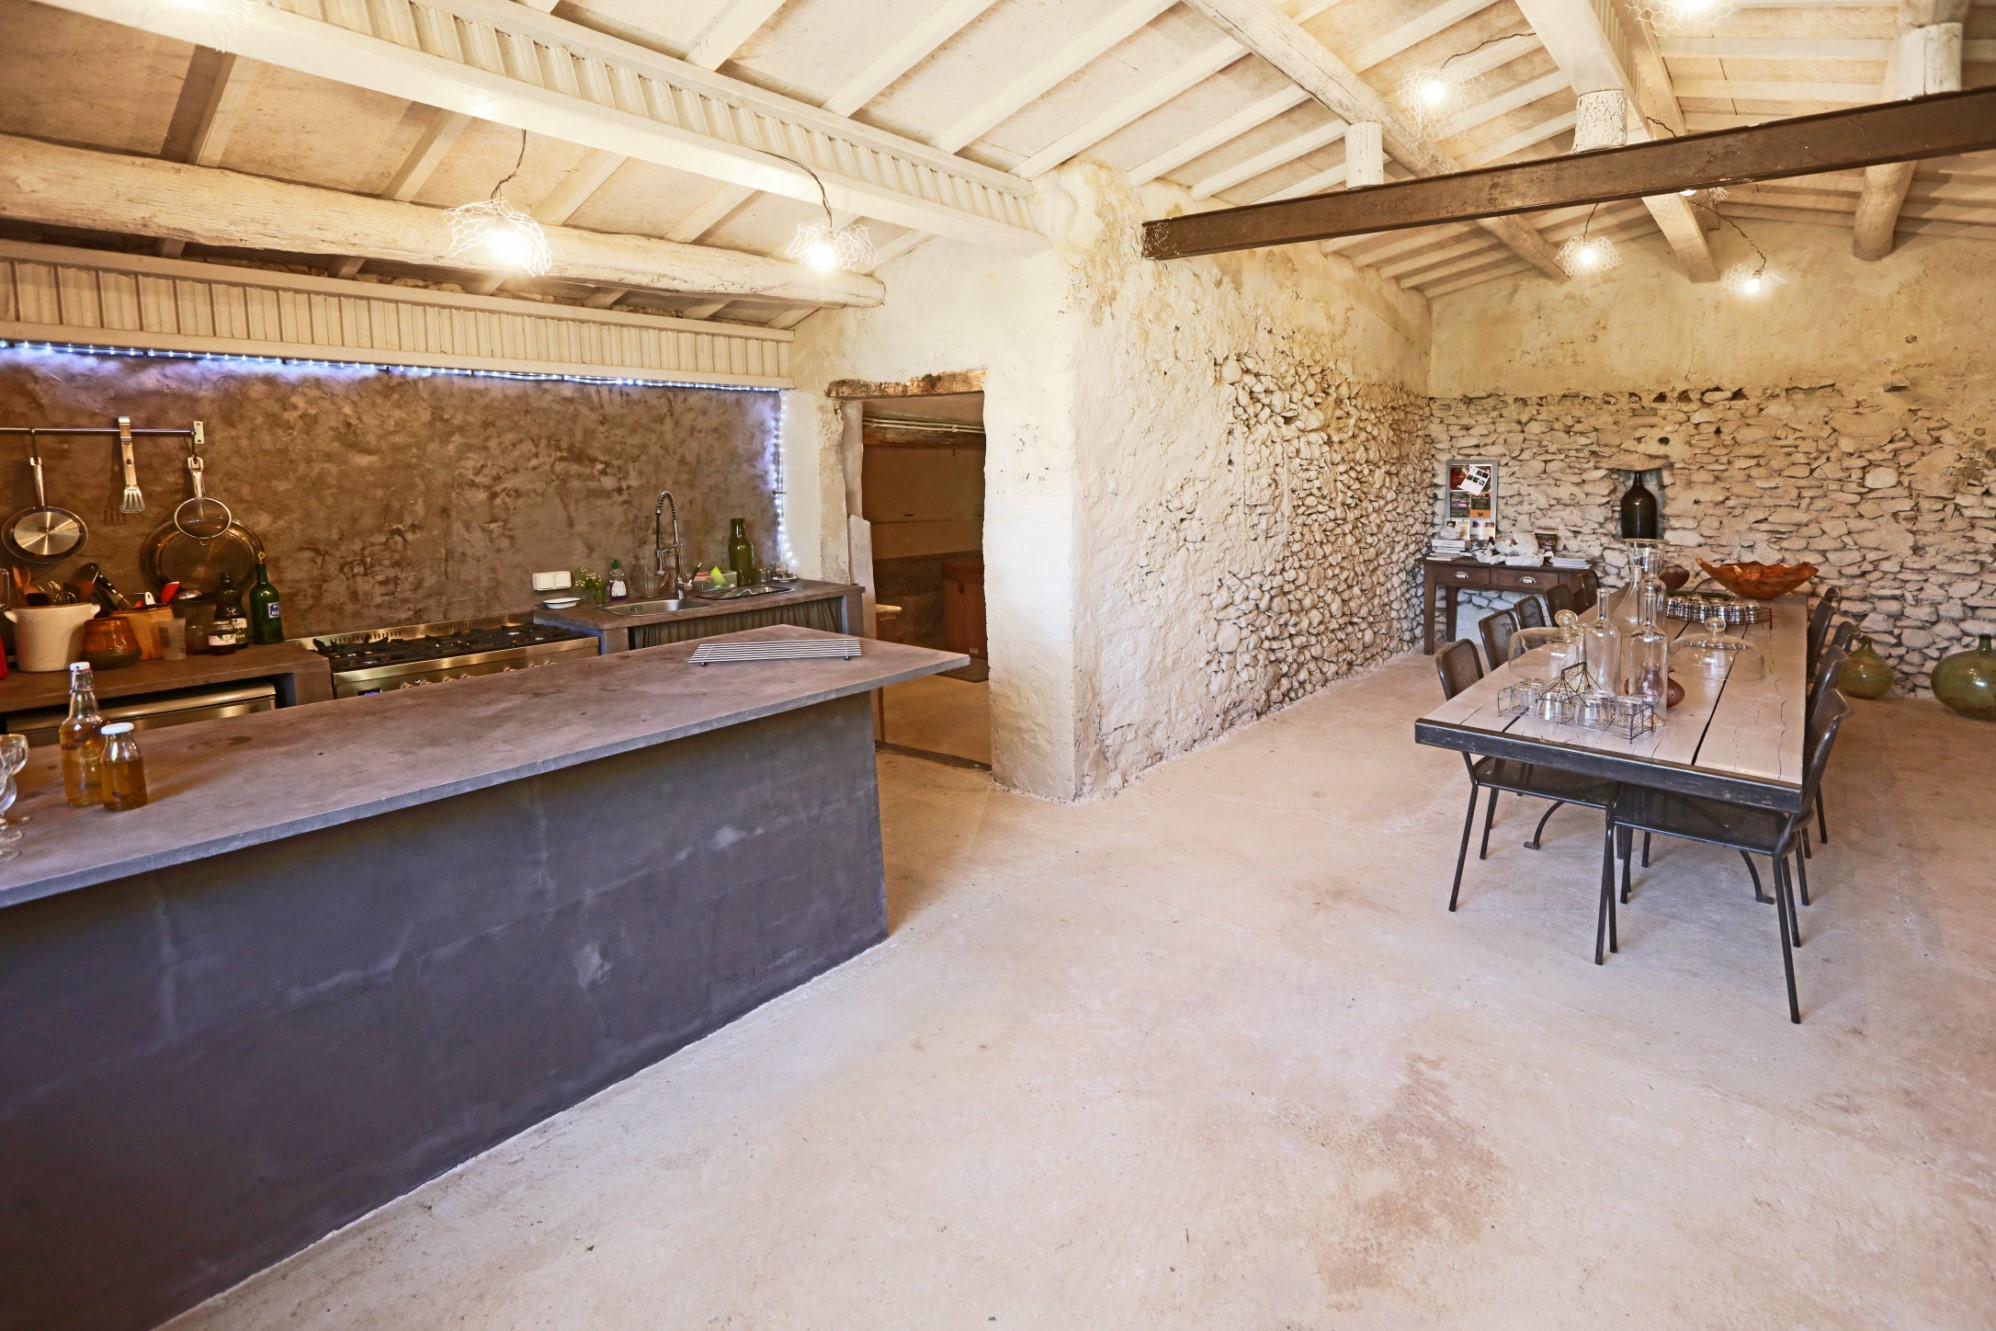 ventes a vendre au c ur du luberon ancien mas restaur en belle campagne agence rosier. Black Bedroom Furniture Sets. Home Design Ideas